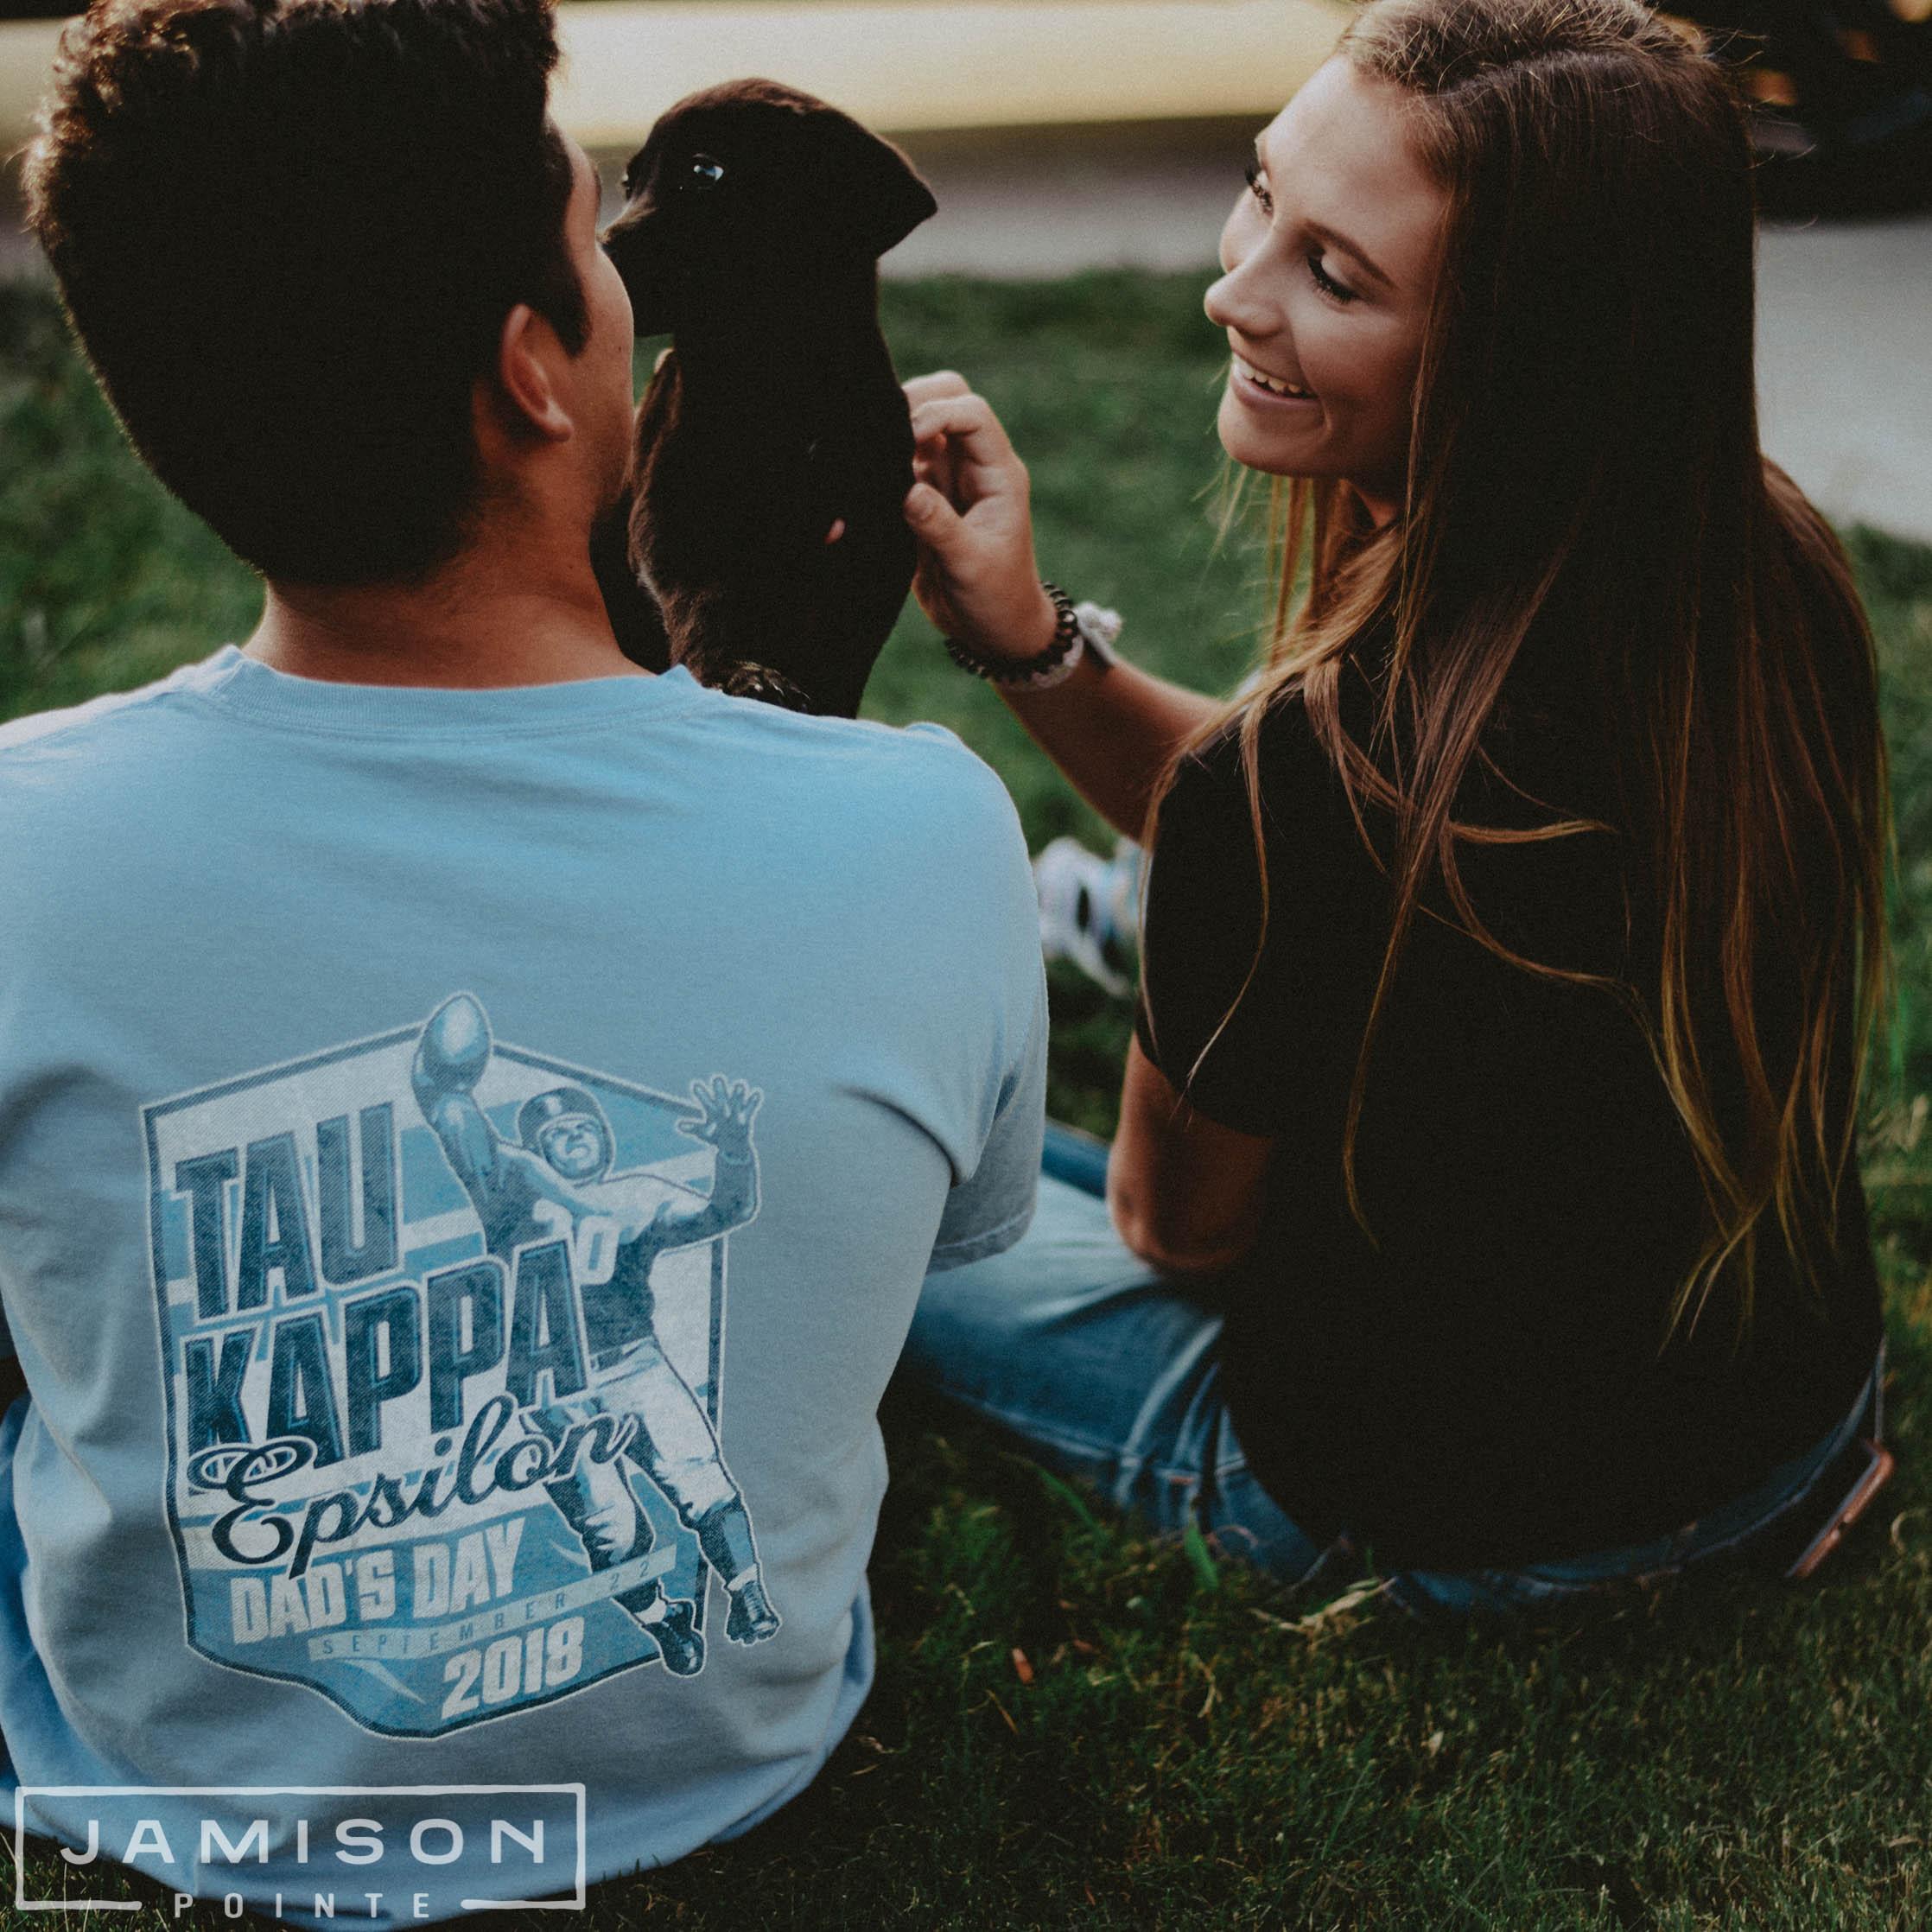 tke-dads-day-t-shirt.jpg